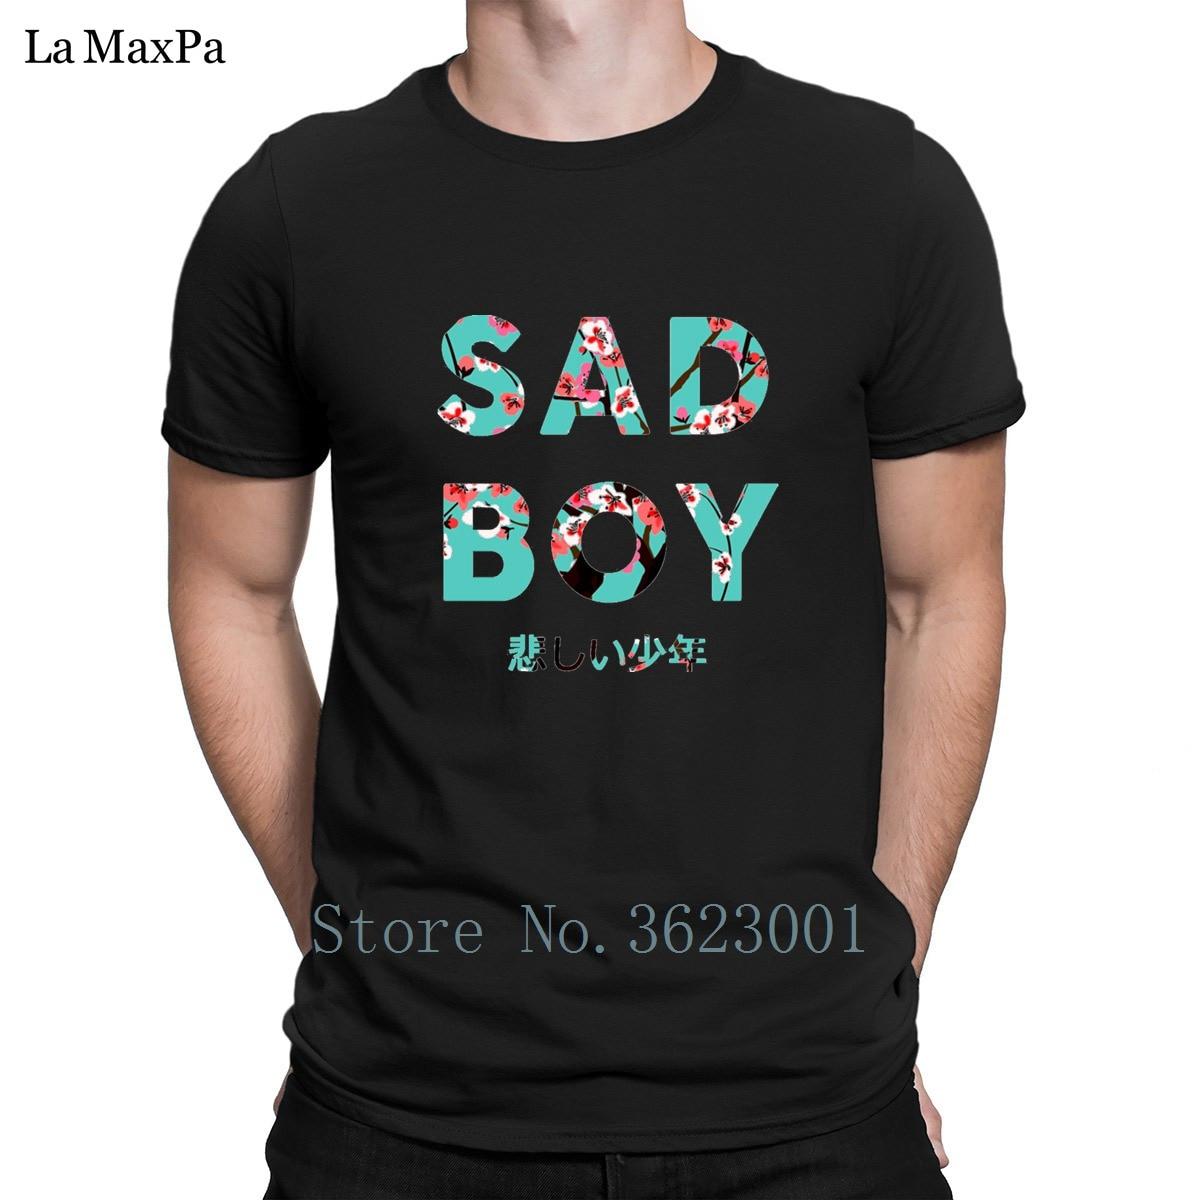 Printing Funny T-Shirt Vaporwave Shirt Arizona Iced Tea Men Tee Shirt Sunlight T Shirt For Men Normal Tshirt Man Euro Size Loose